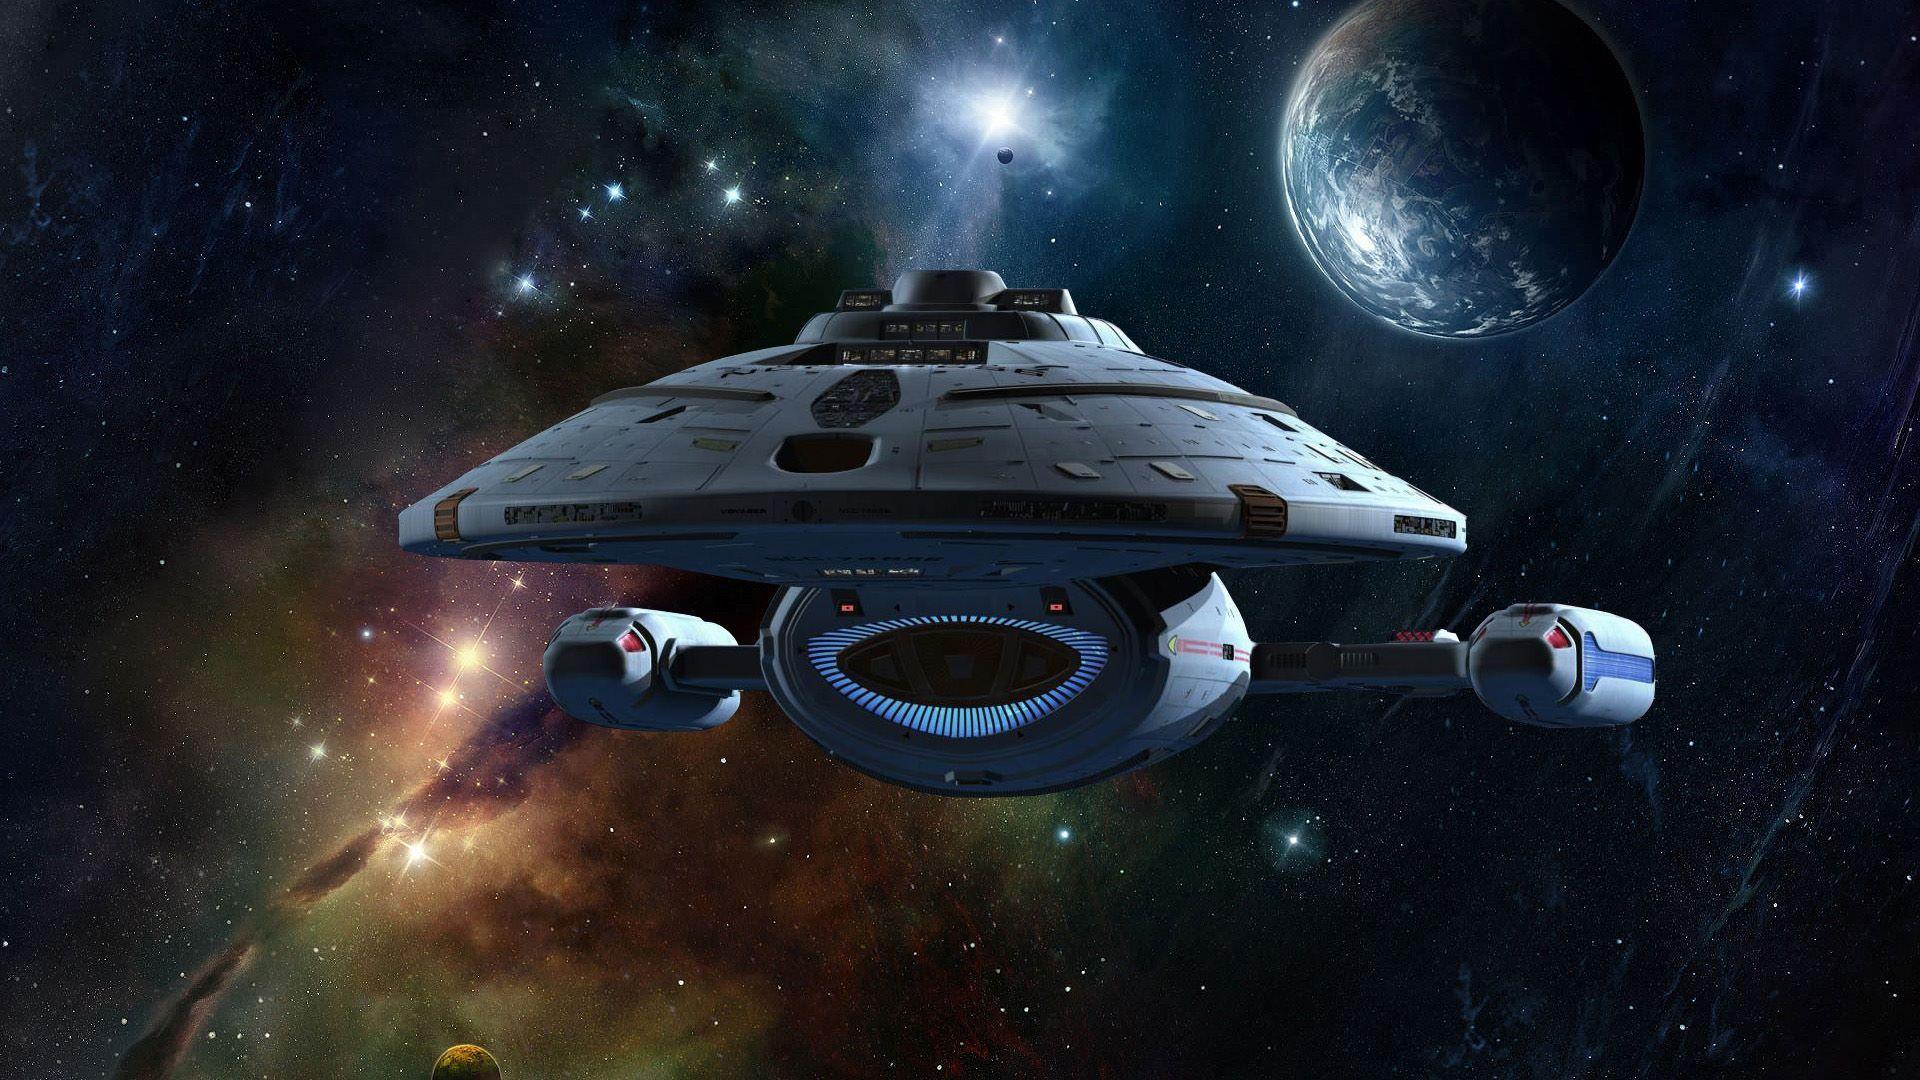 Starship voyager star trek voyager fanart